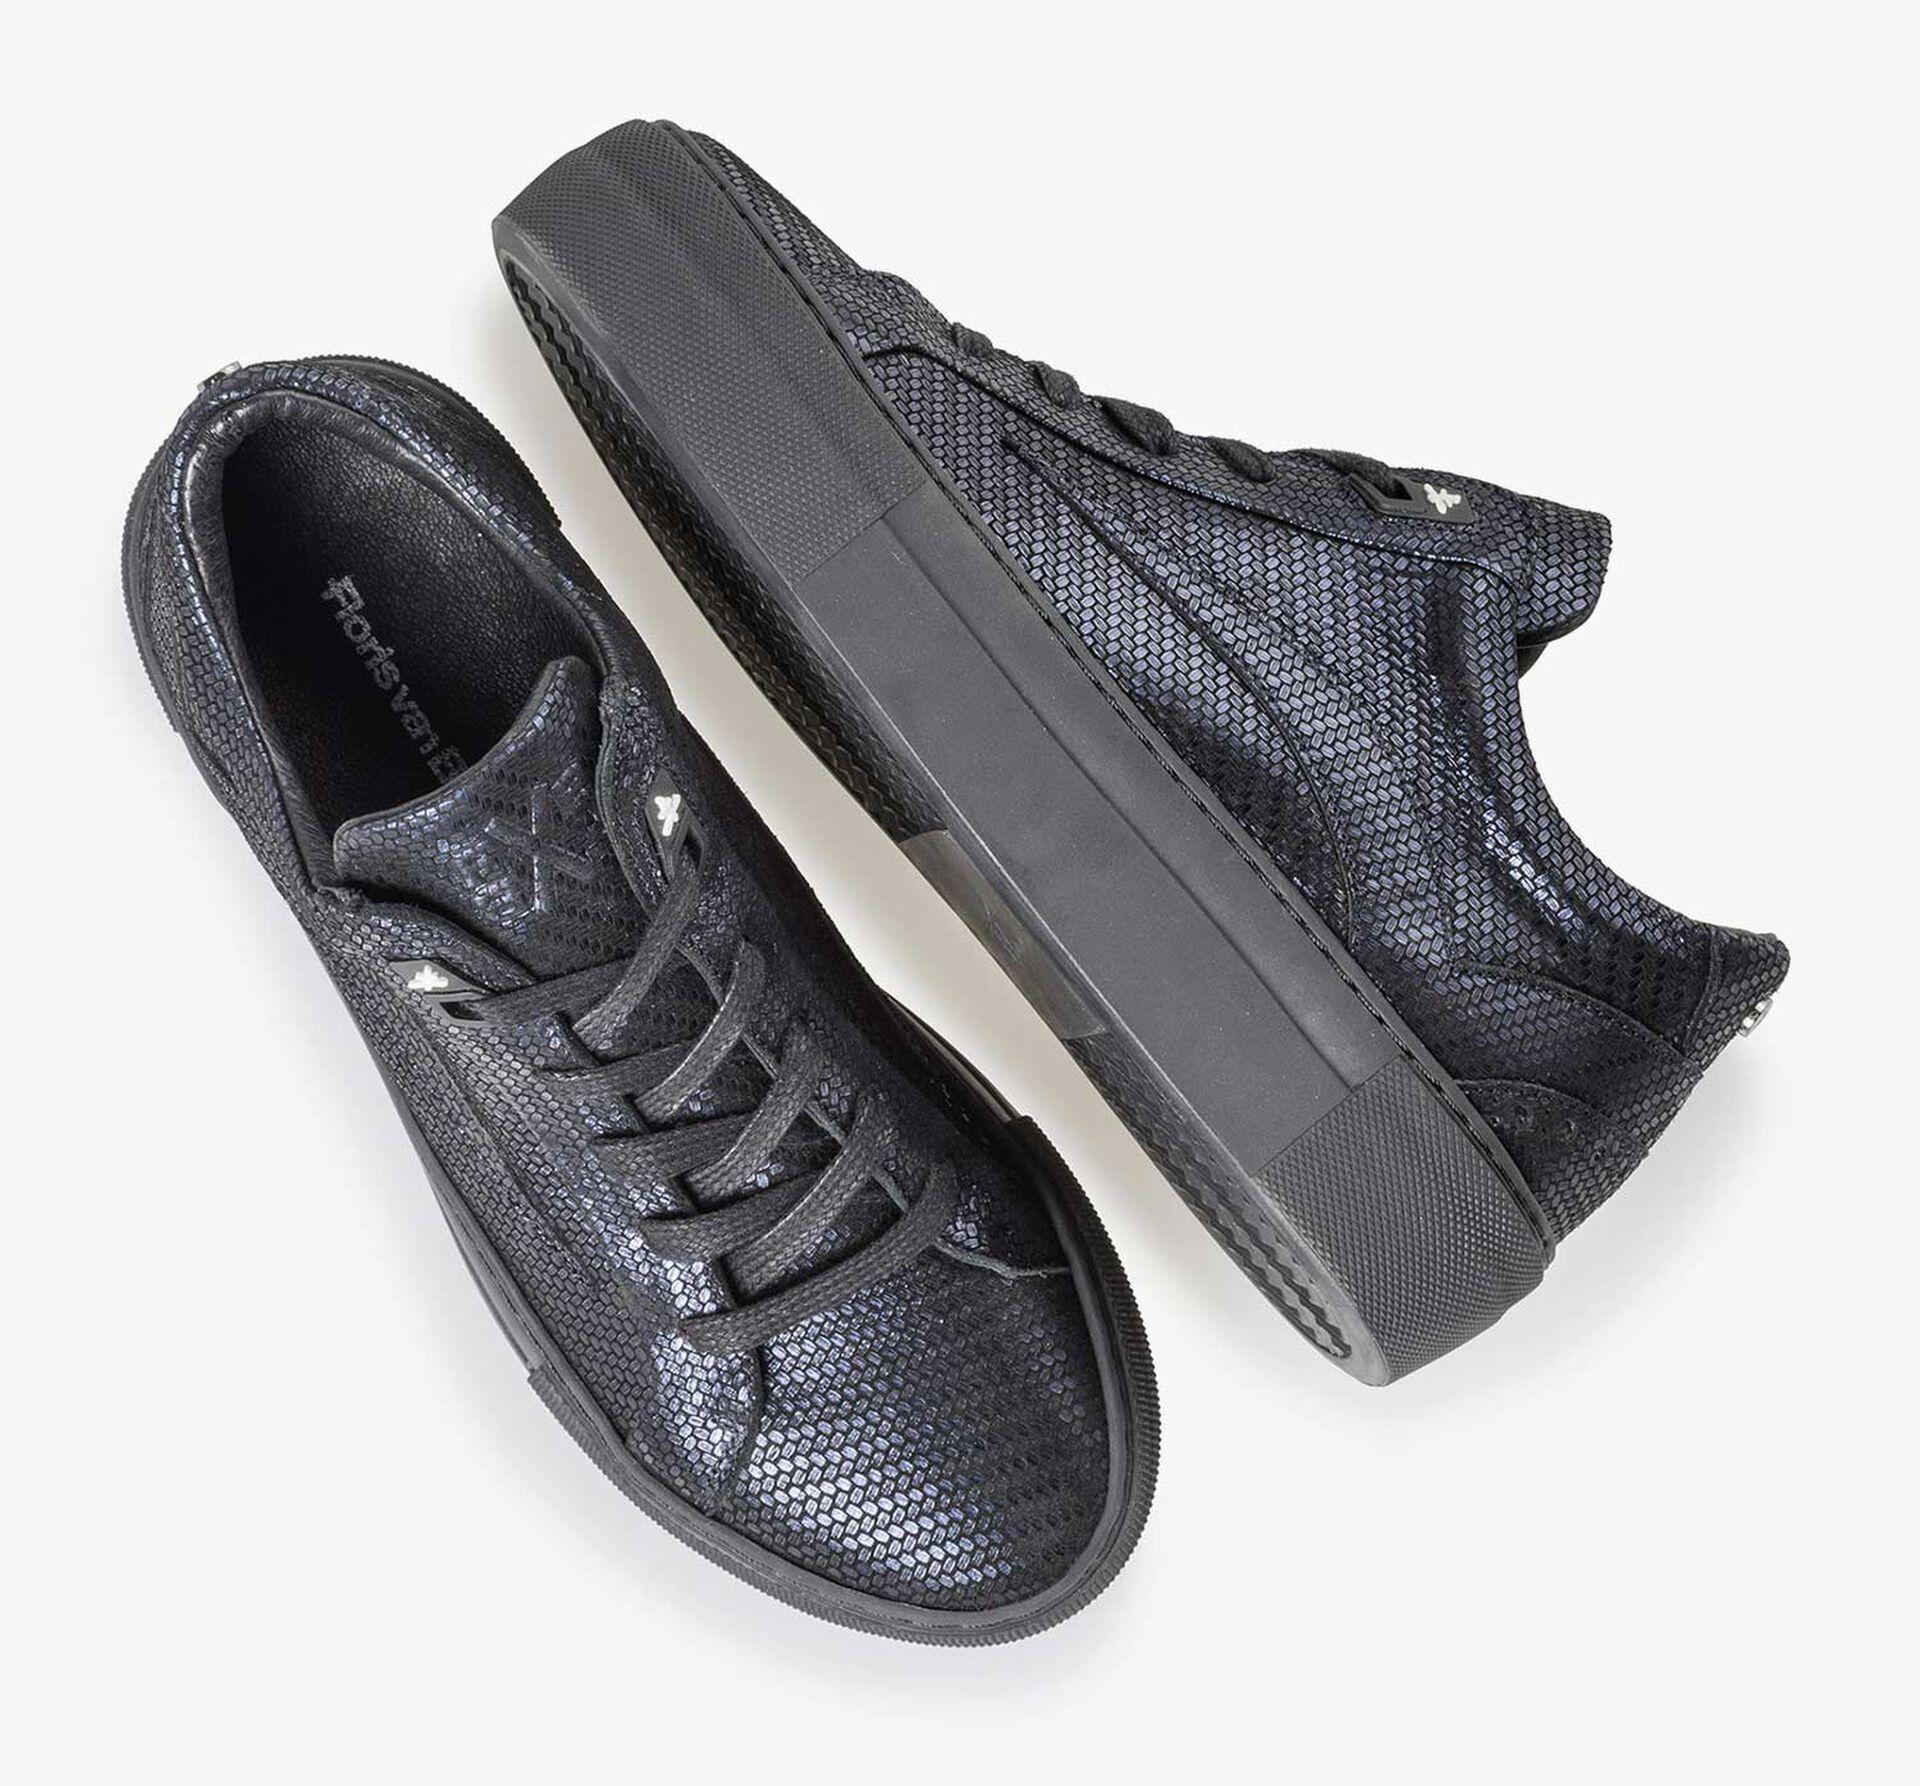 Blauer Leder-Sneaker mit Metallic-Print